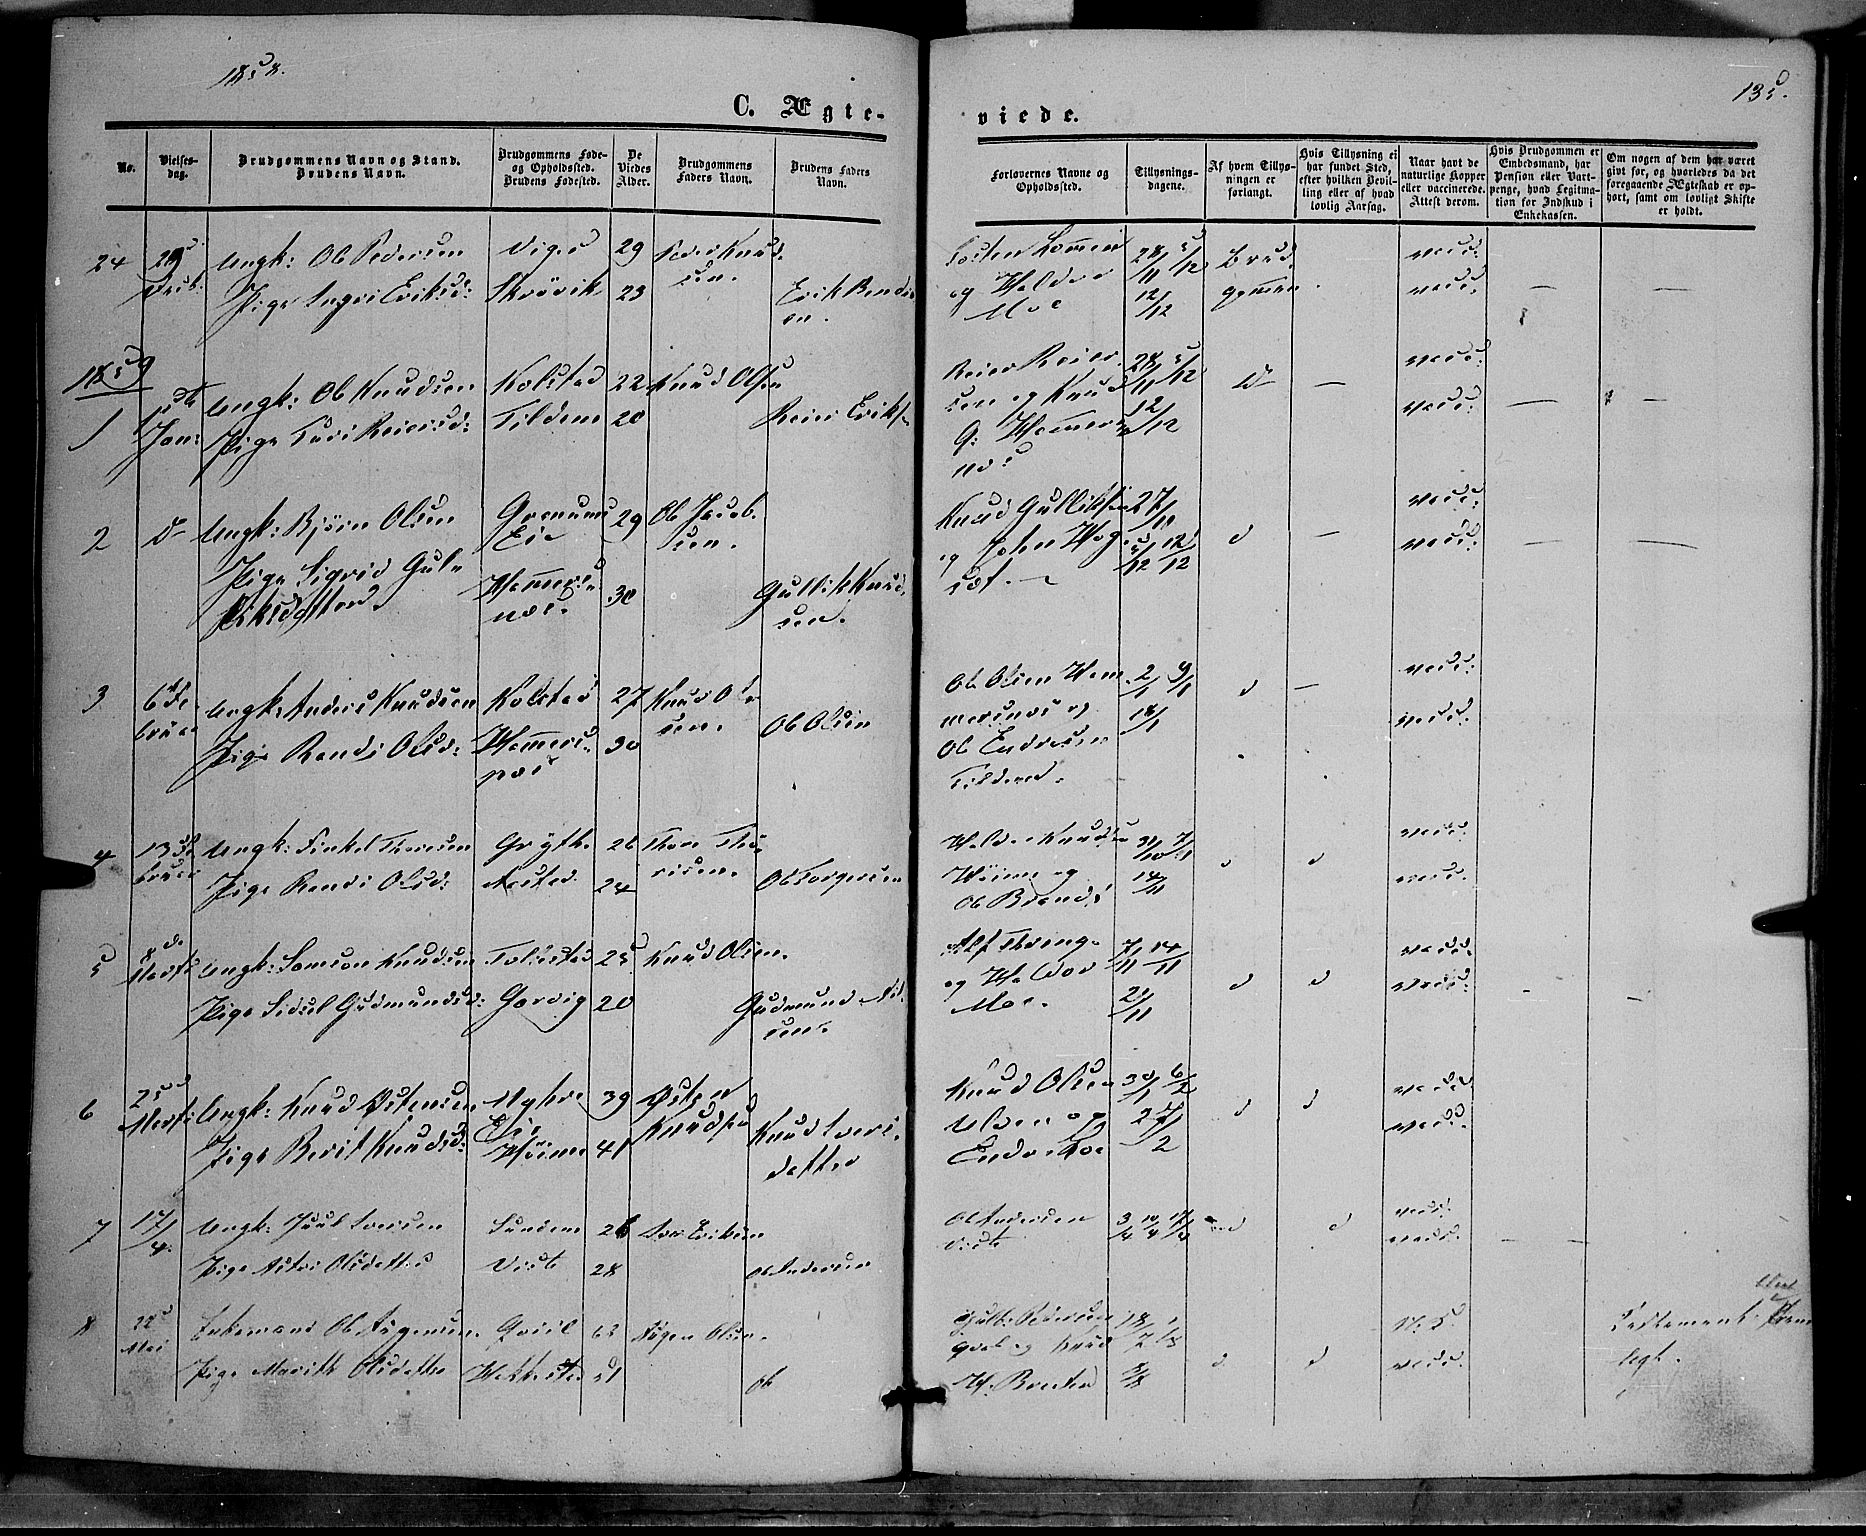 SAH, Vestre Slidre prestekontor, Ministerialbok nr. 2, 1856-1864, s. 135